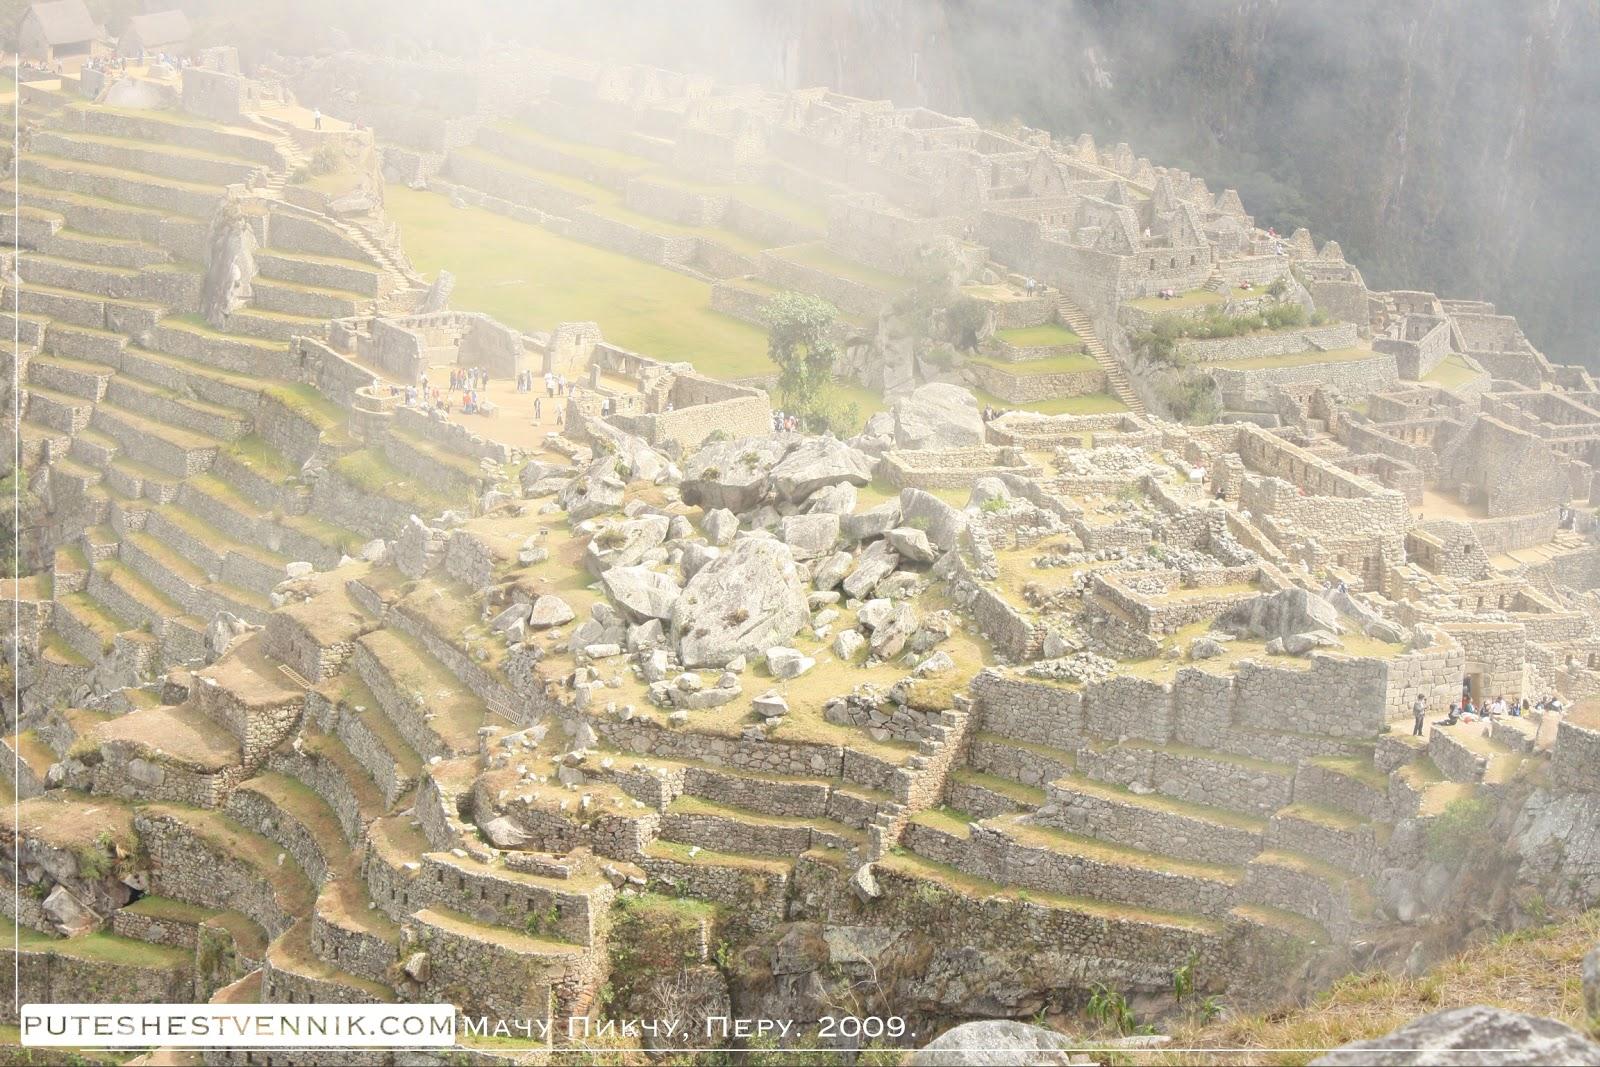 Дымка тумана над древними развалинами